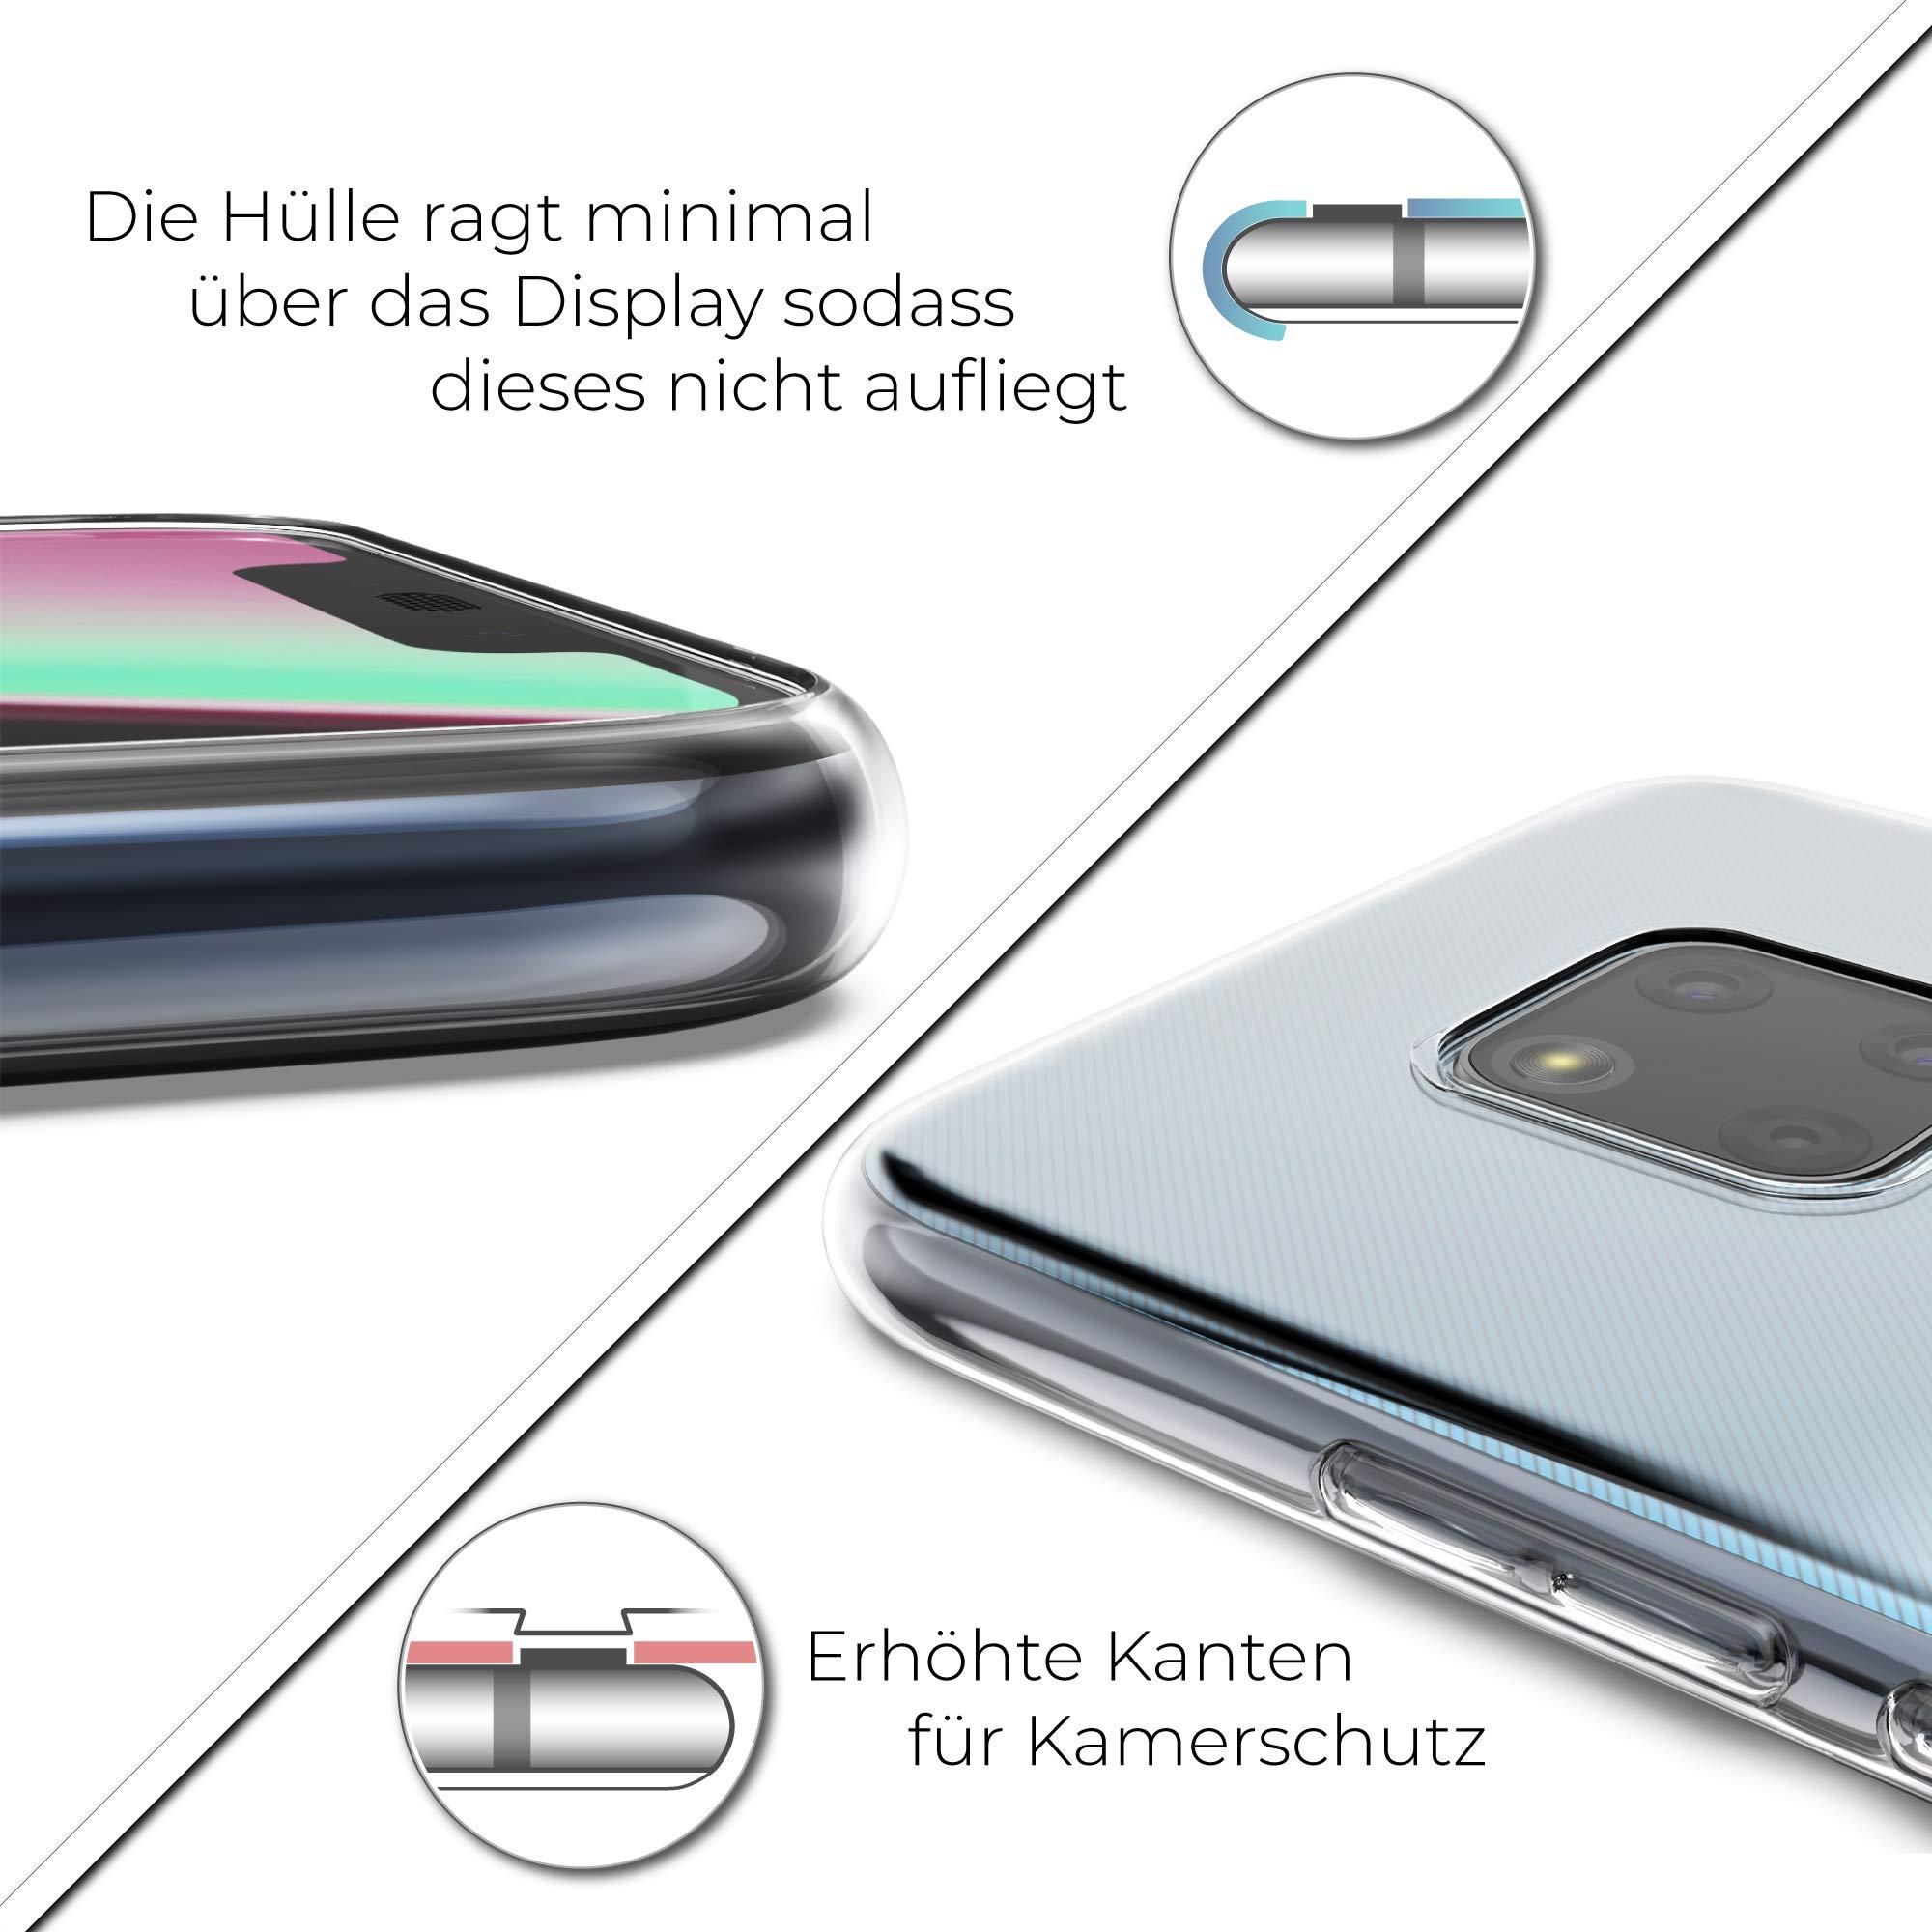 UTECTION Handyhülle Silikon für Huawei Mate 20 Pro - Robuster Schutz, Ultra-Slim, Ideale Passform - Qi-Kompatibel - Mate20 Pro Hülle Transparent - TPU Case Silikonhülle Durchsichtig